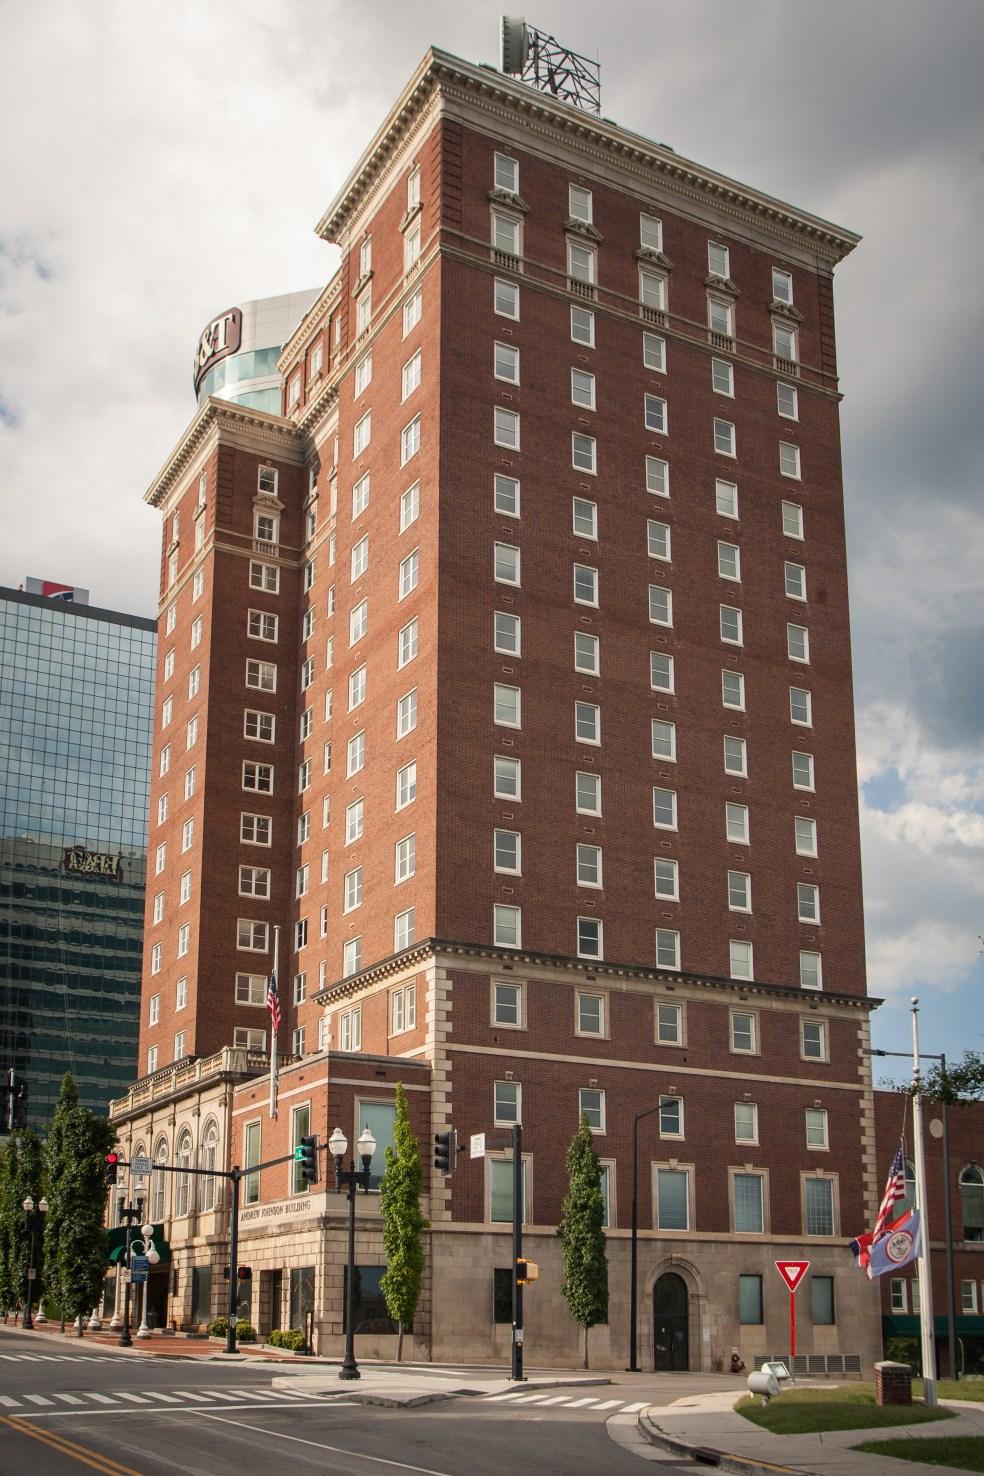 Andrew Johnson Building